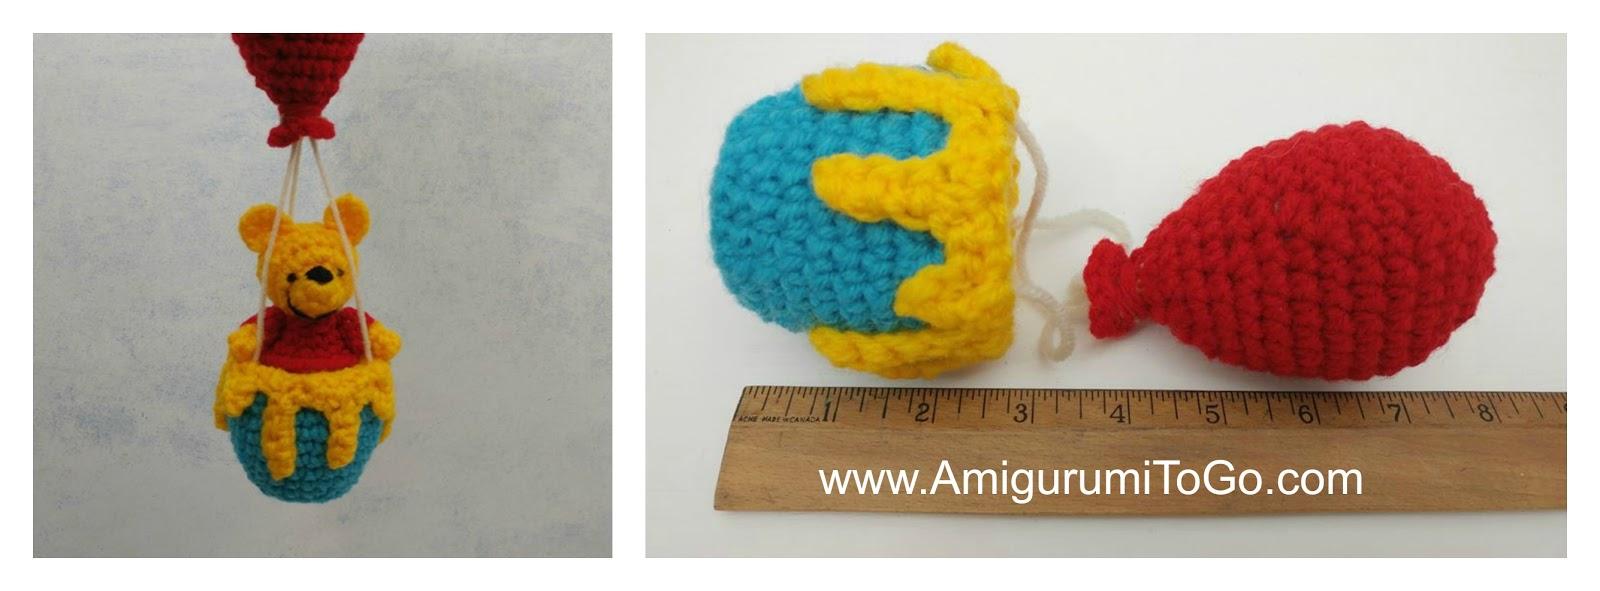 599 Best Crochet I Like - Disney Winnie the Pooh and Friends ... | 591x1600